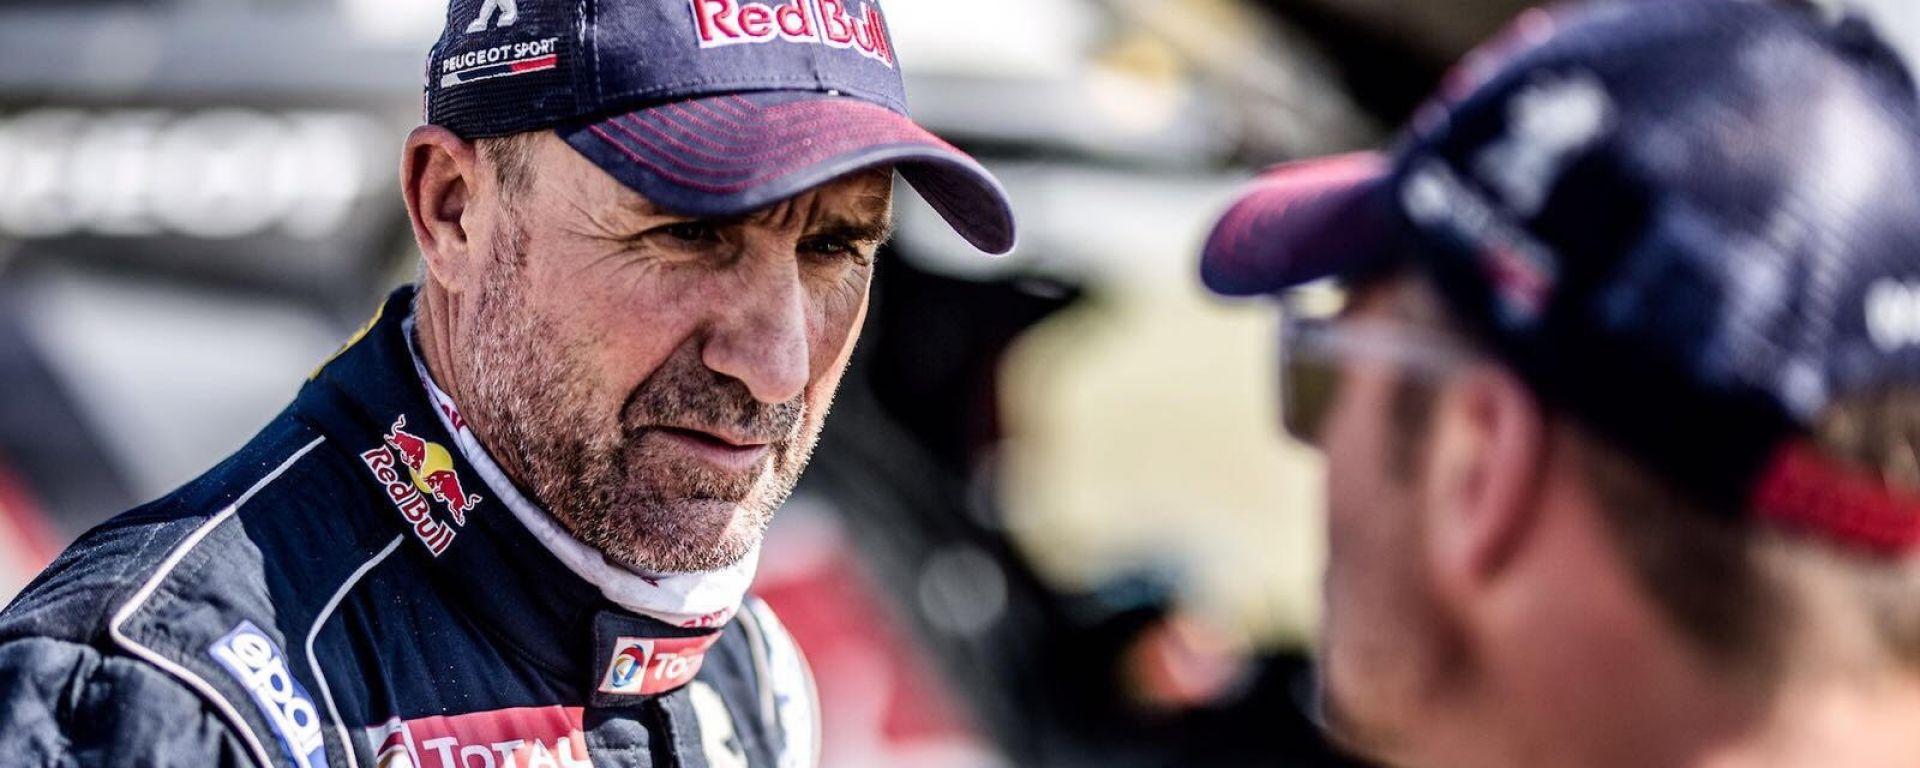 Peterhansel - Team Peugeot Sport